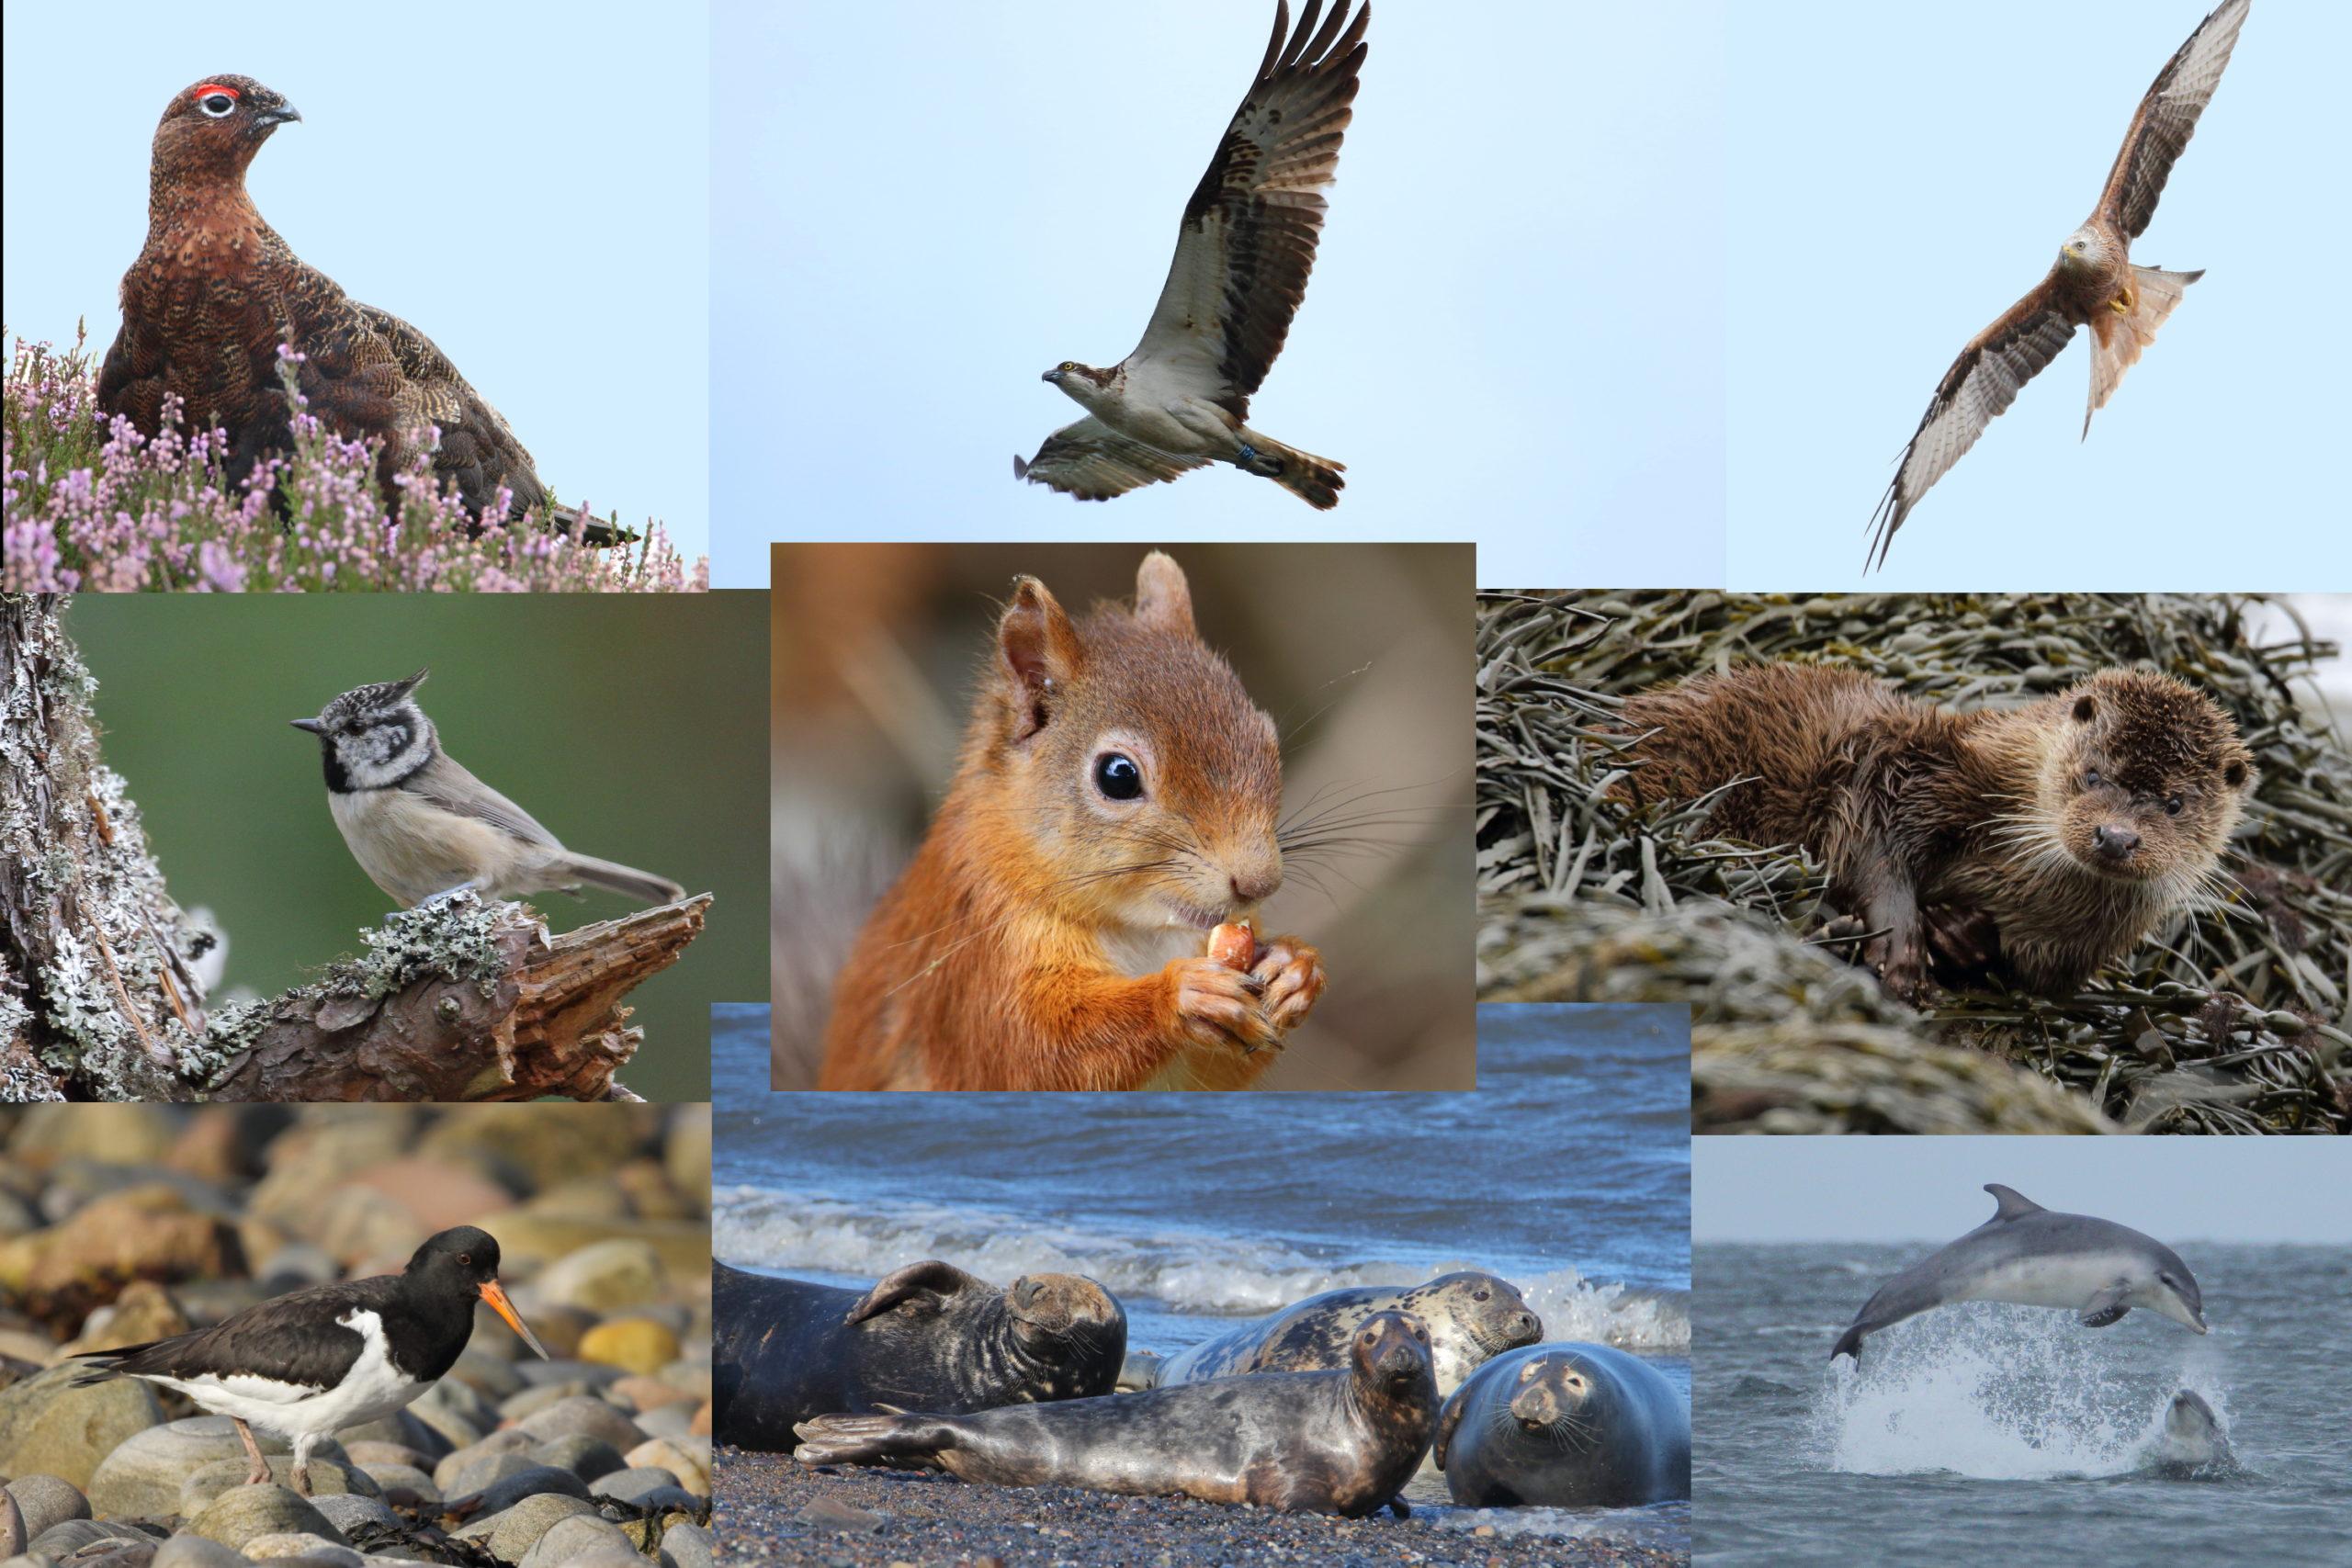 wildlife around Hiddenglen, Nairn